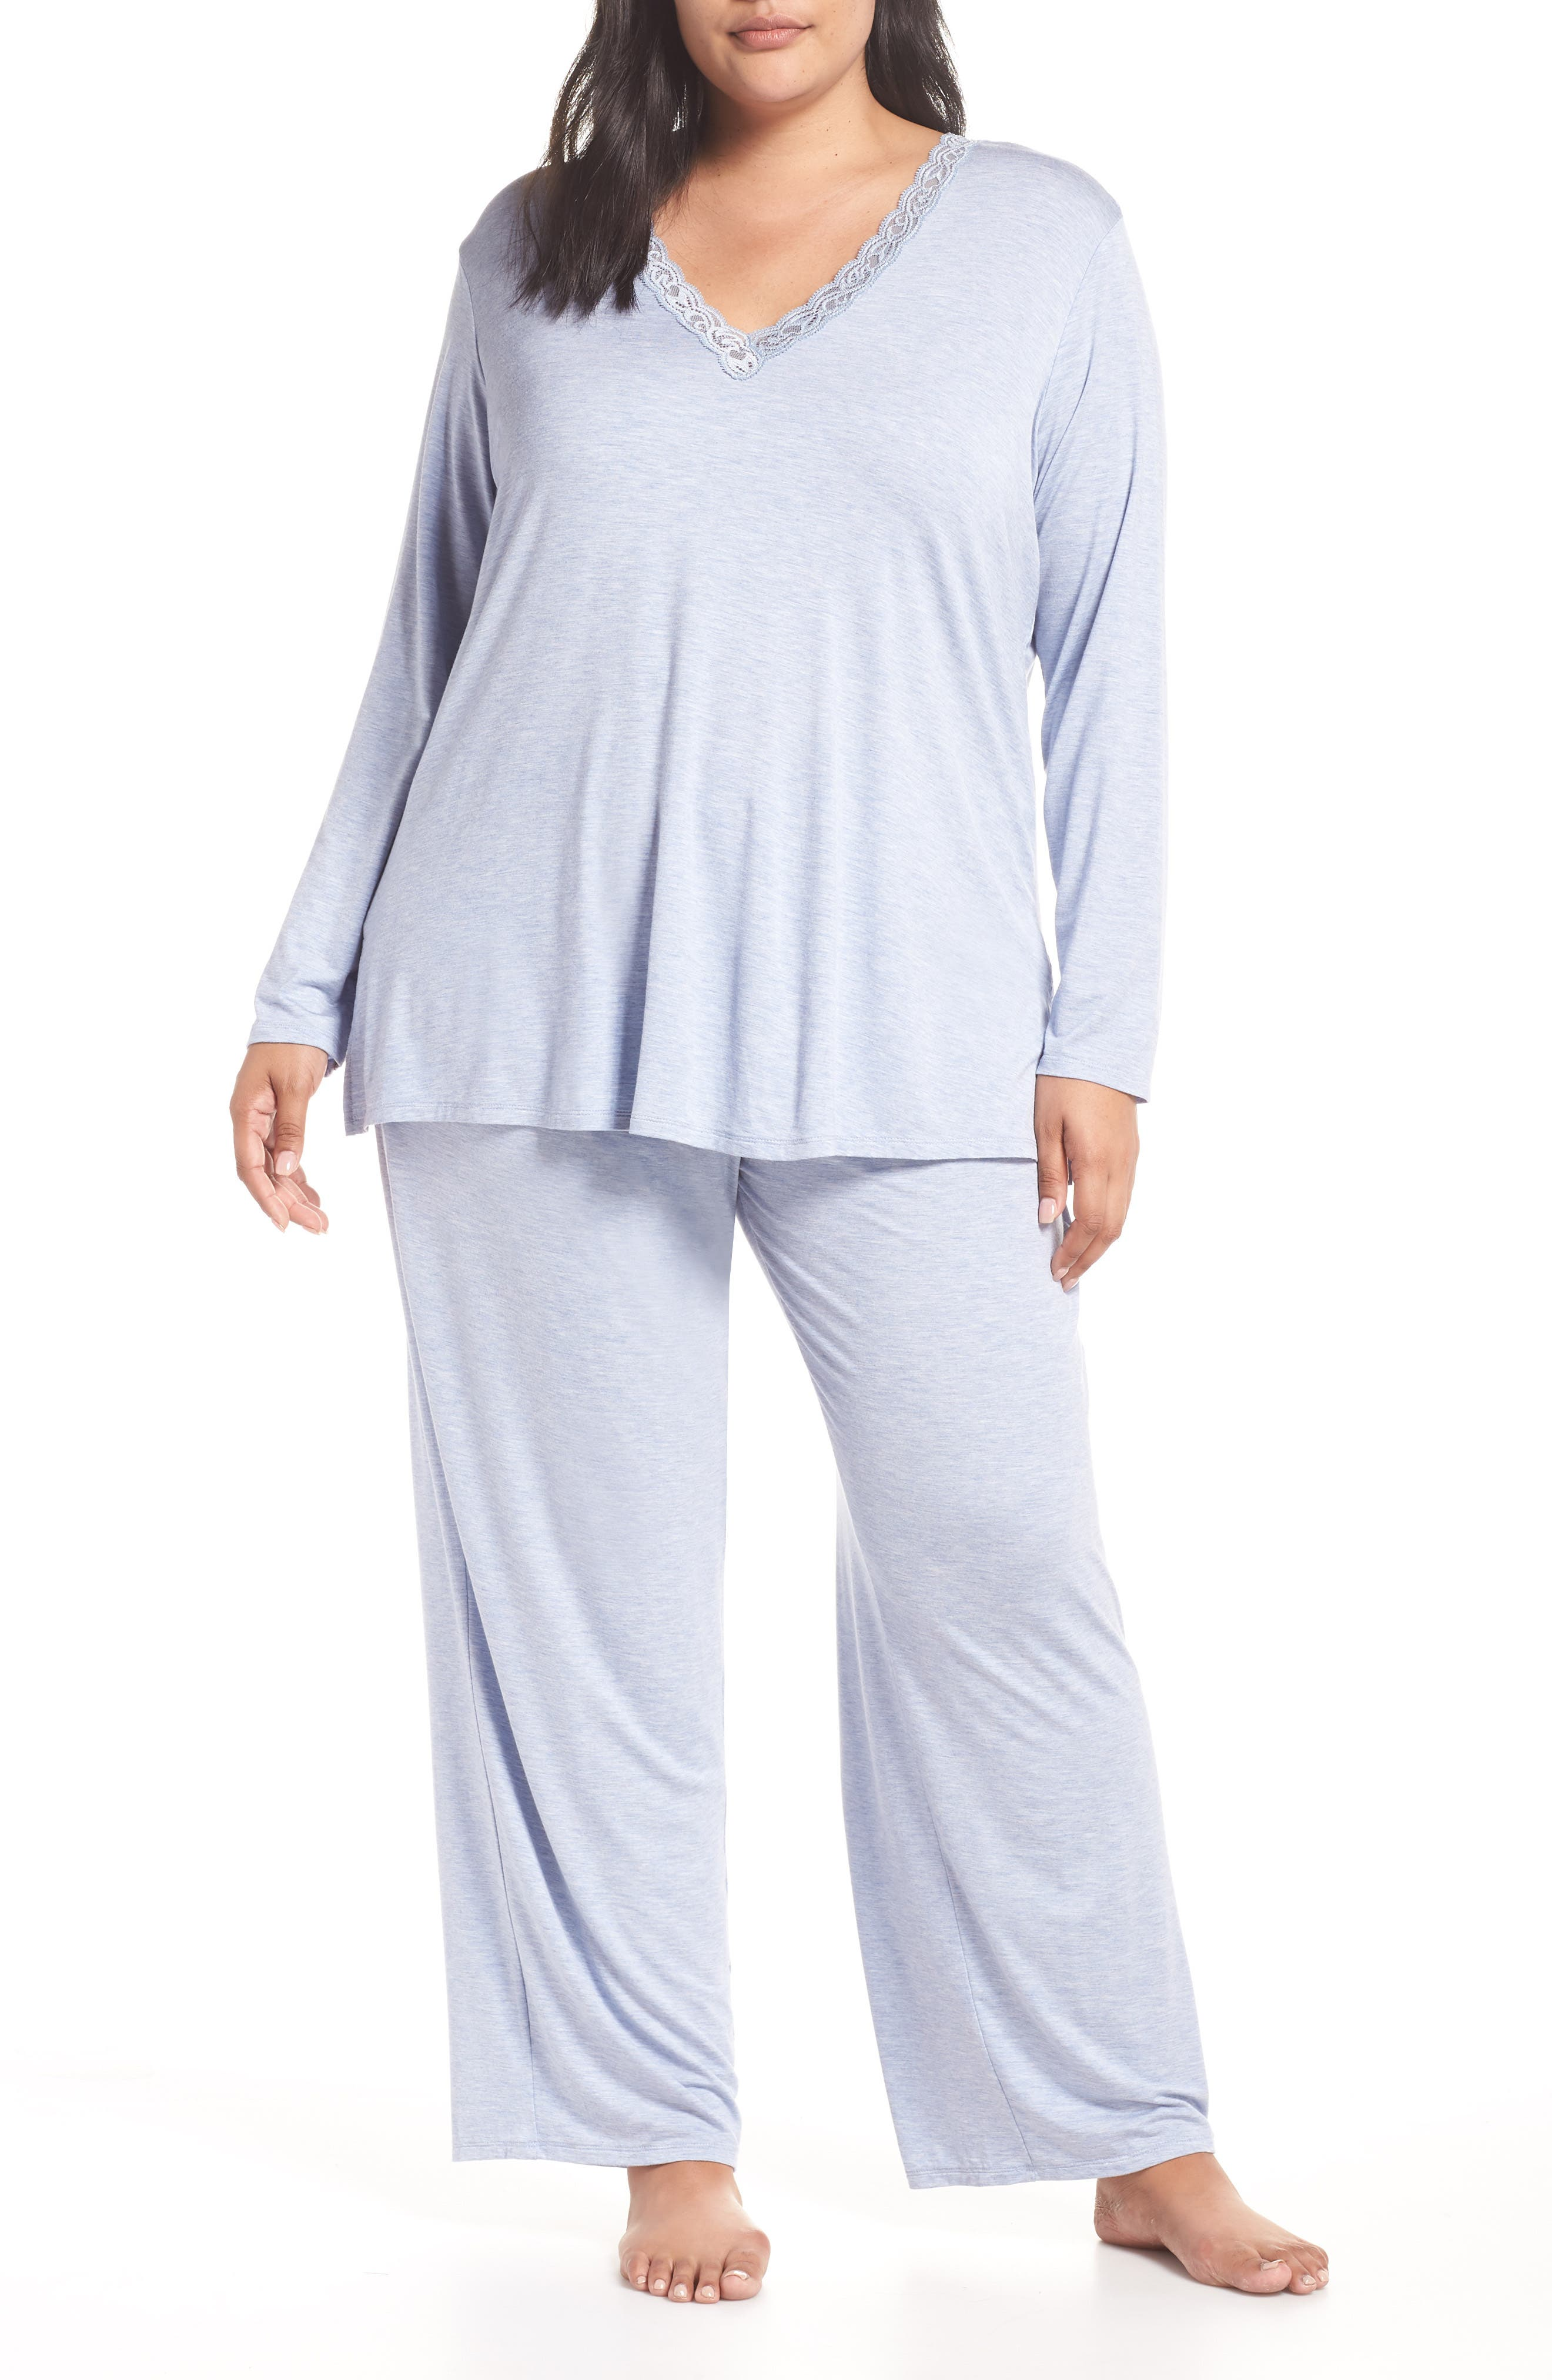 NATORI, Feathers Pajamas, Main thumbnail 1, color, 470